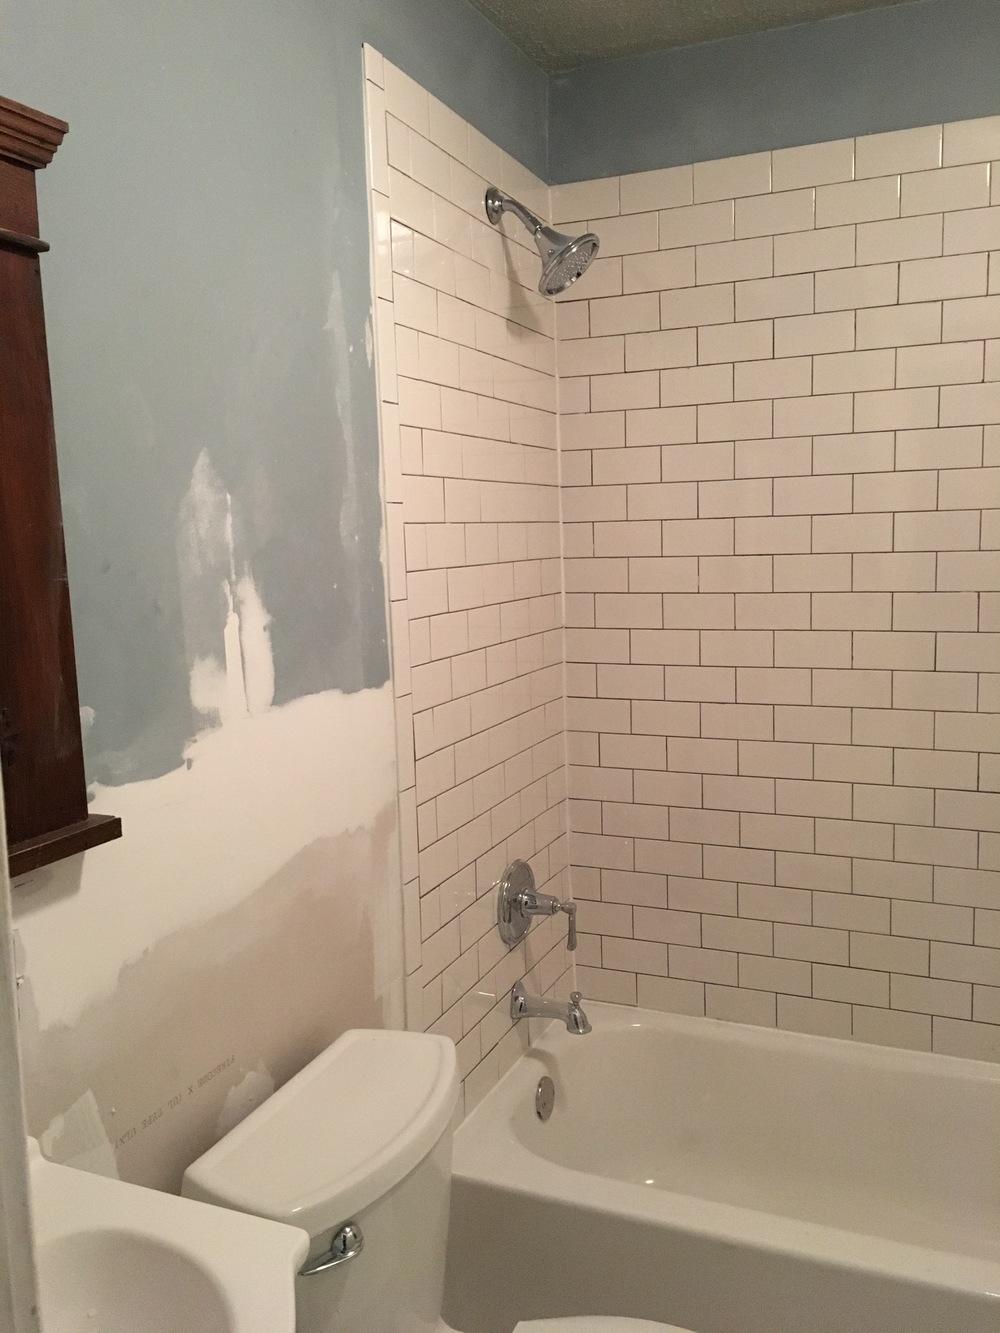 Bathroom Floor Tiles Uneven Cleaning Slate Tile Enter Image - Unlevel basement floor